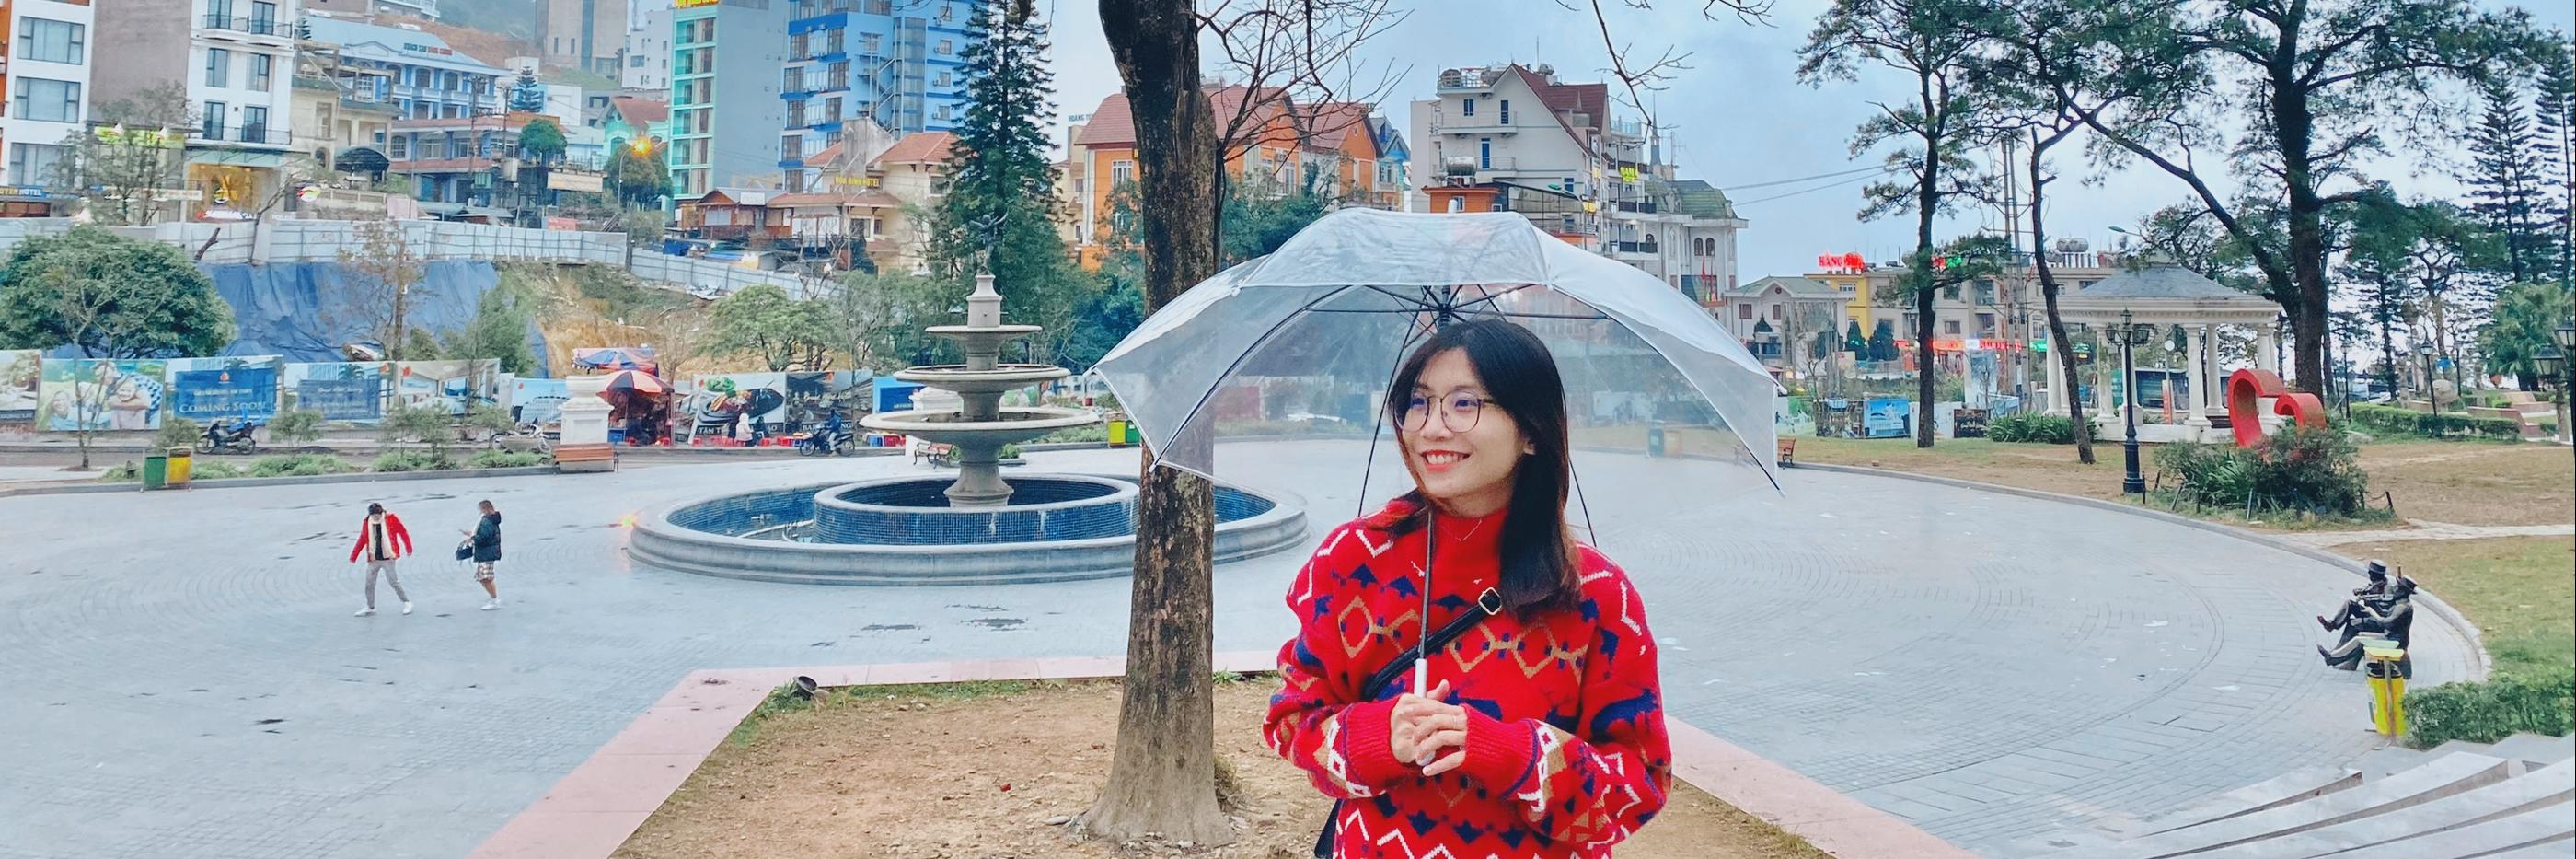 https://gody.vn/blog/nhoa.29941281/post/hanh-trinh-tam-dao-mu-suong-2n1d-bang-xe-khach-chi-voi-1-trieu-dong-8090